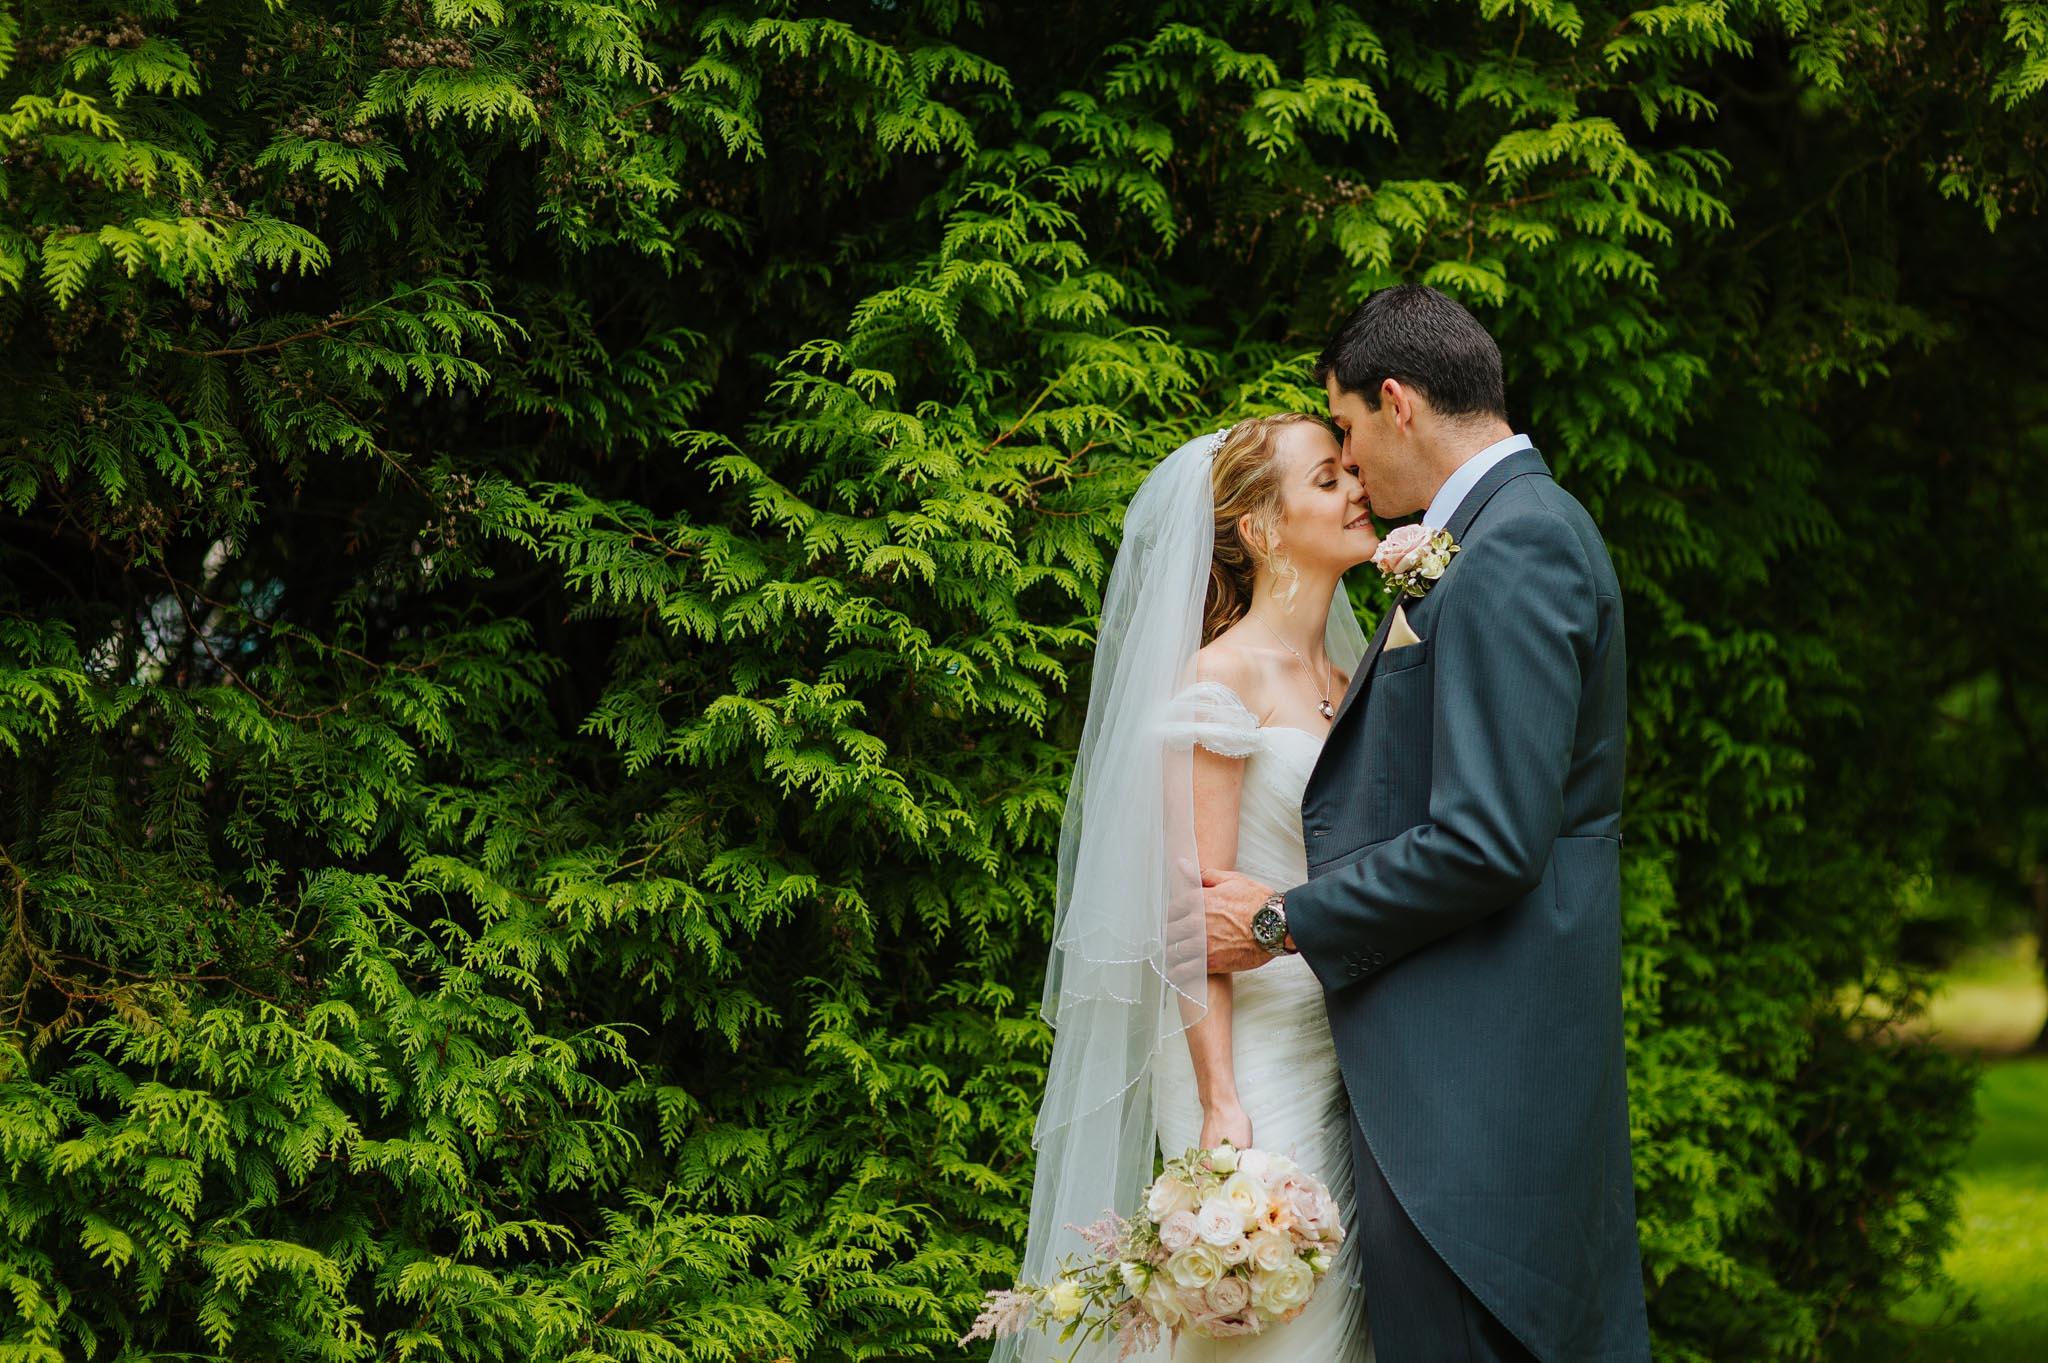 Georgina + Mike - Wedding photography in Malvern, Worcestershire 51